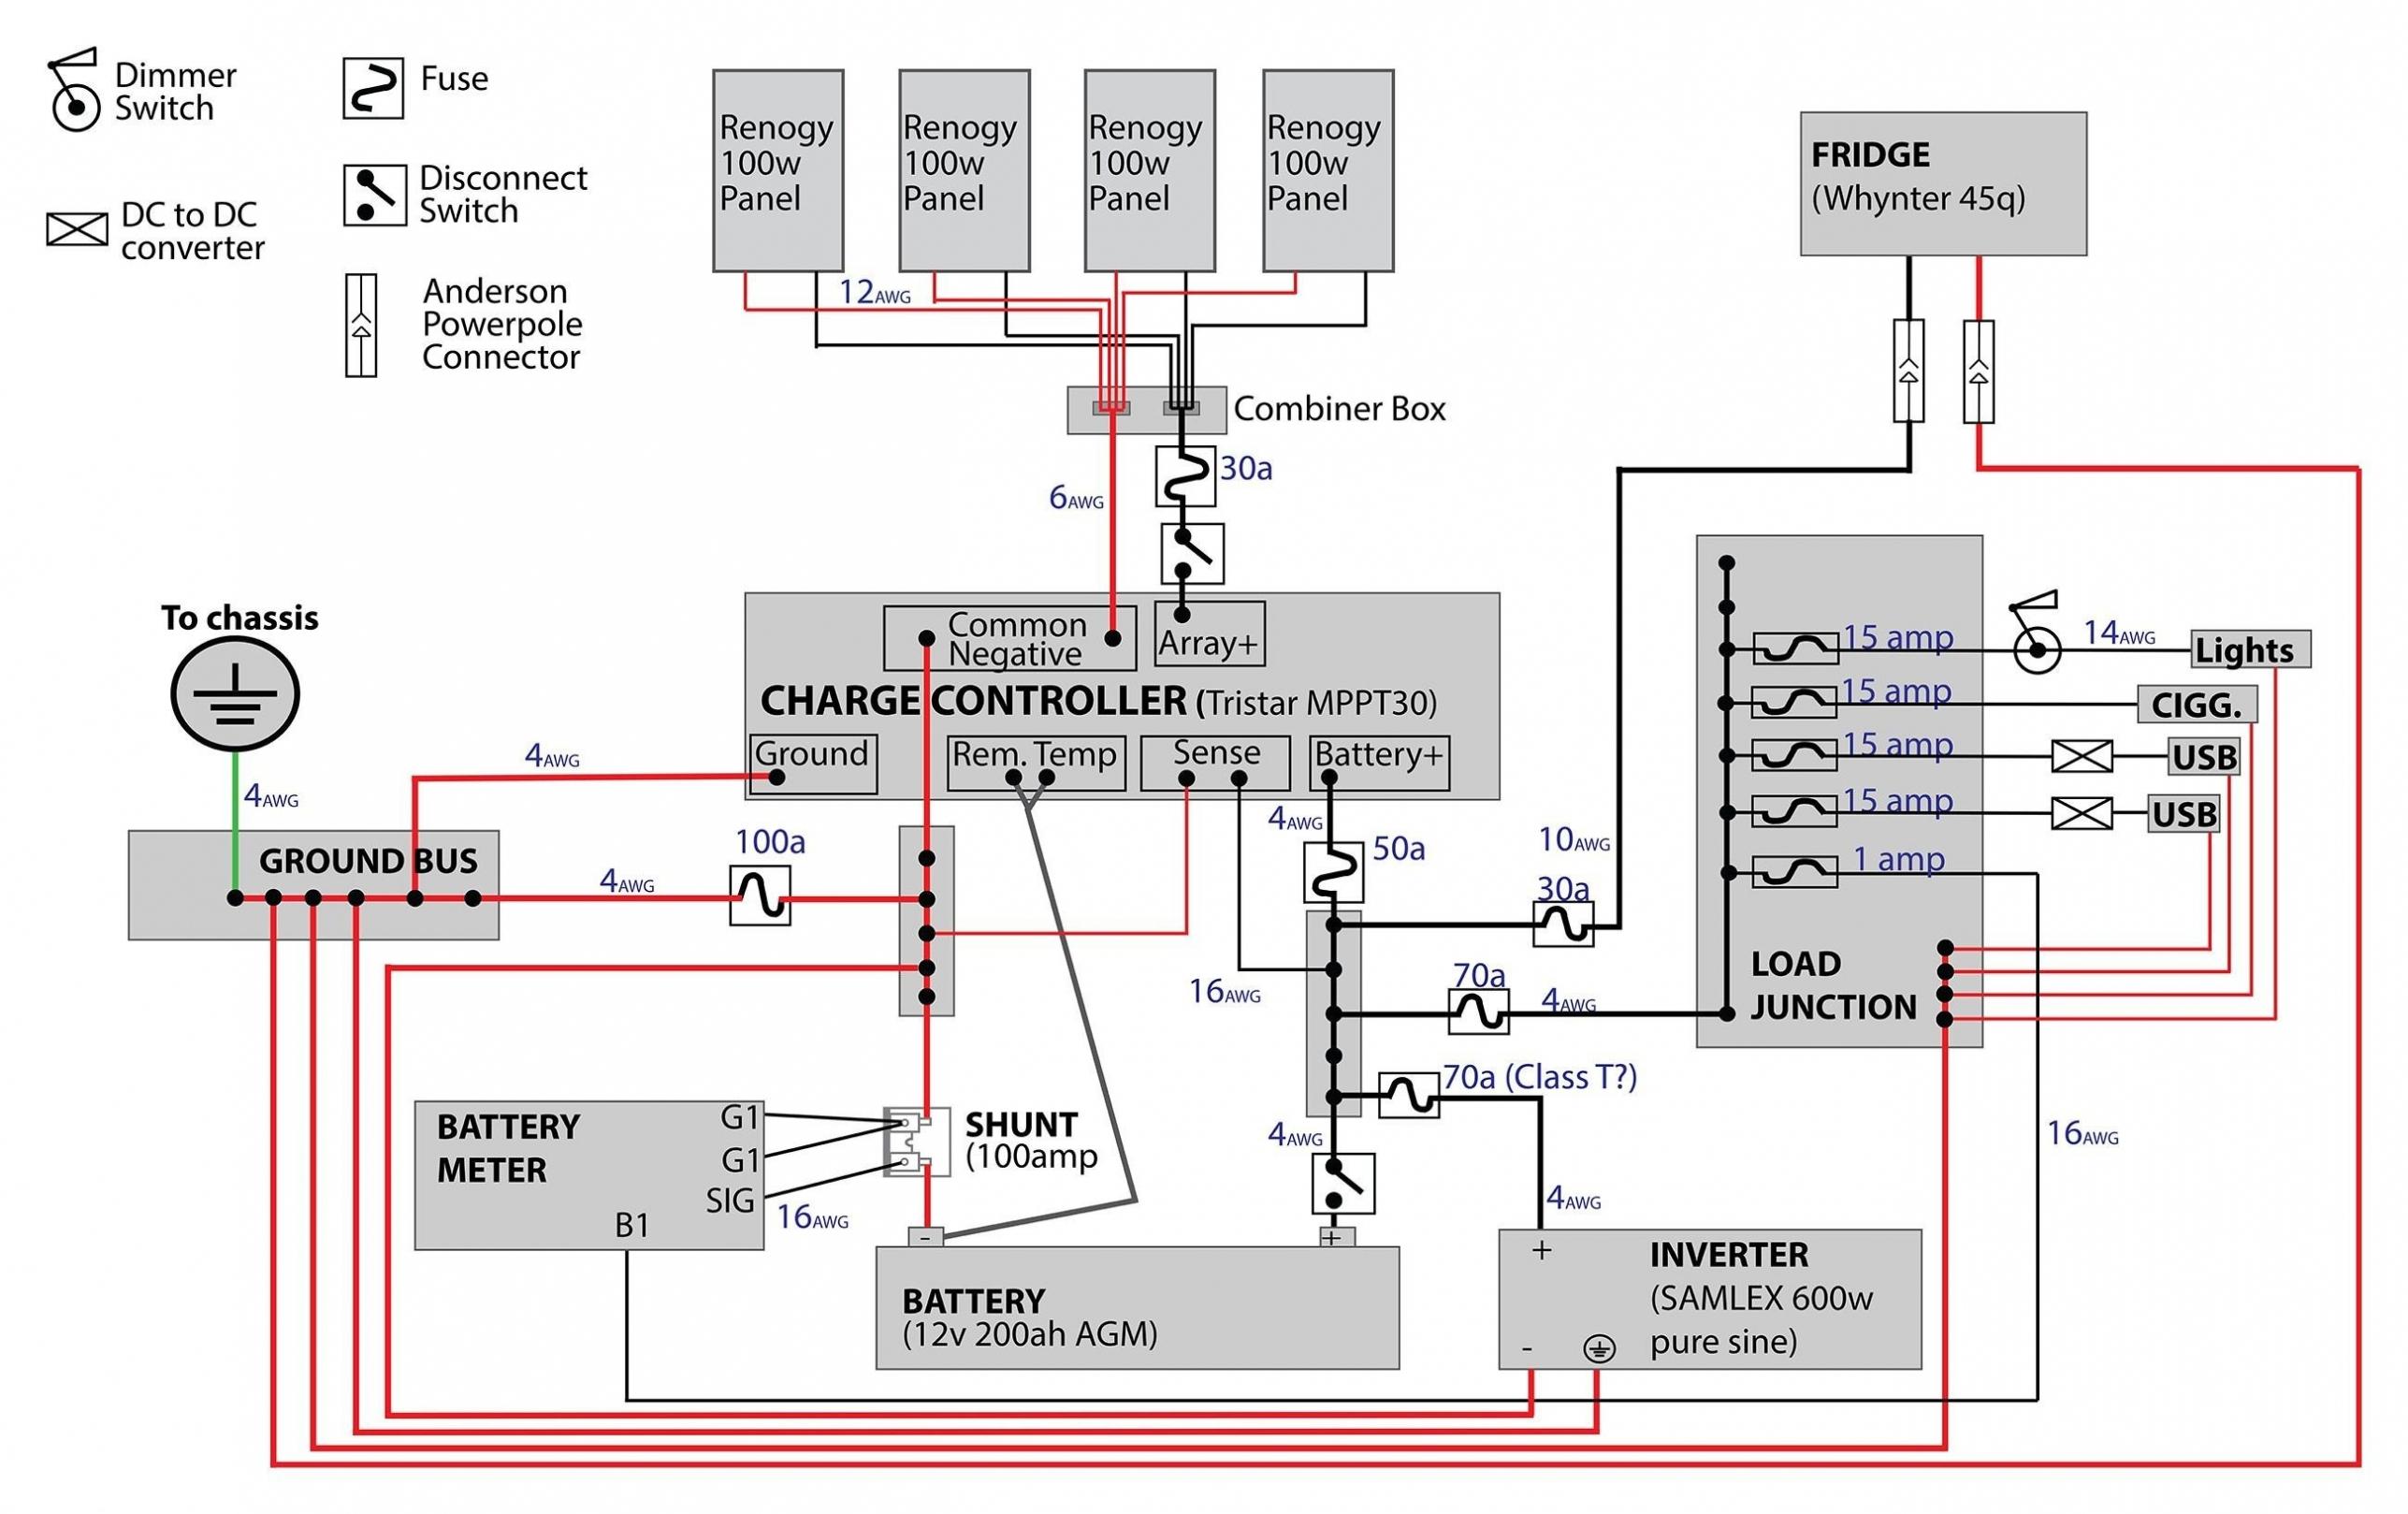 Monaco Motorhome Wiring Diagram | Wiring Diagram - Monaco Rv Wiring Diagram